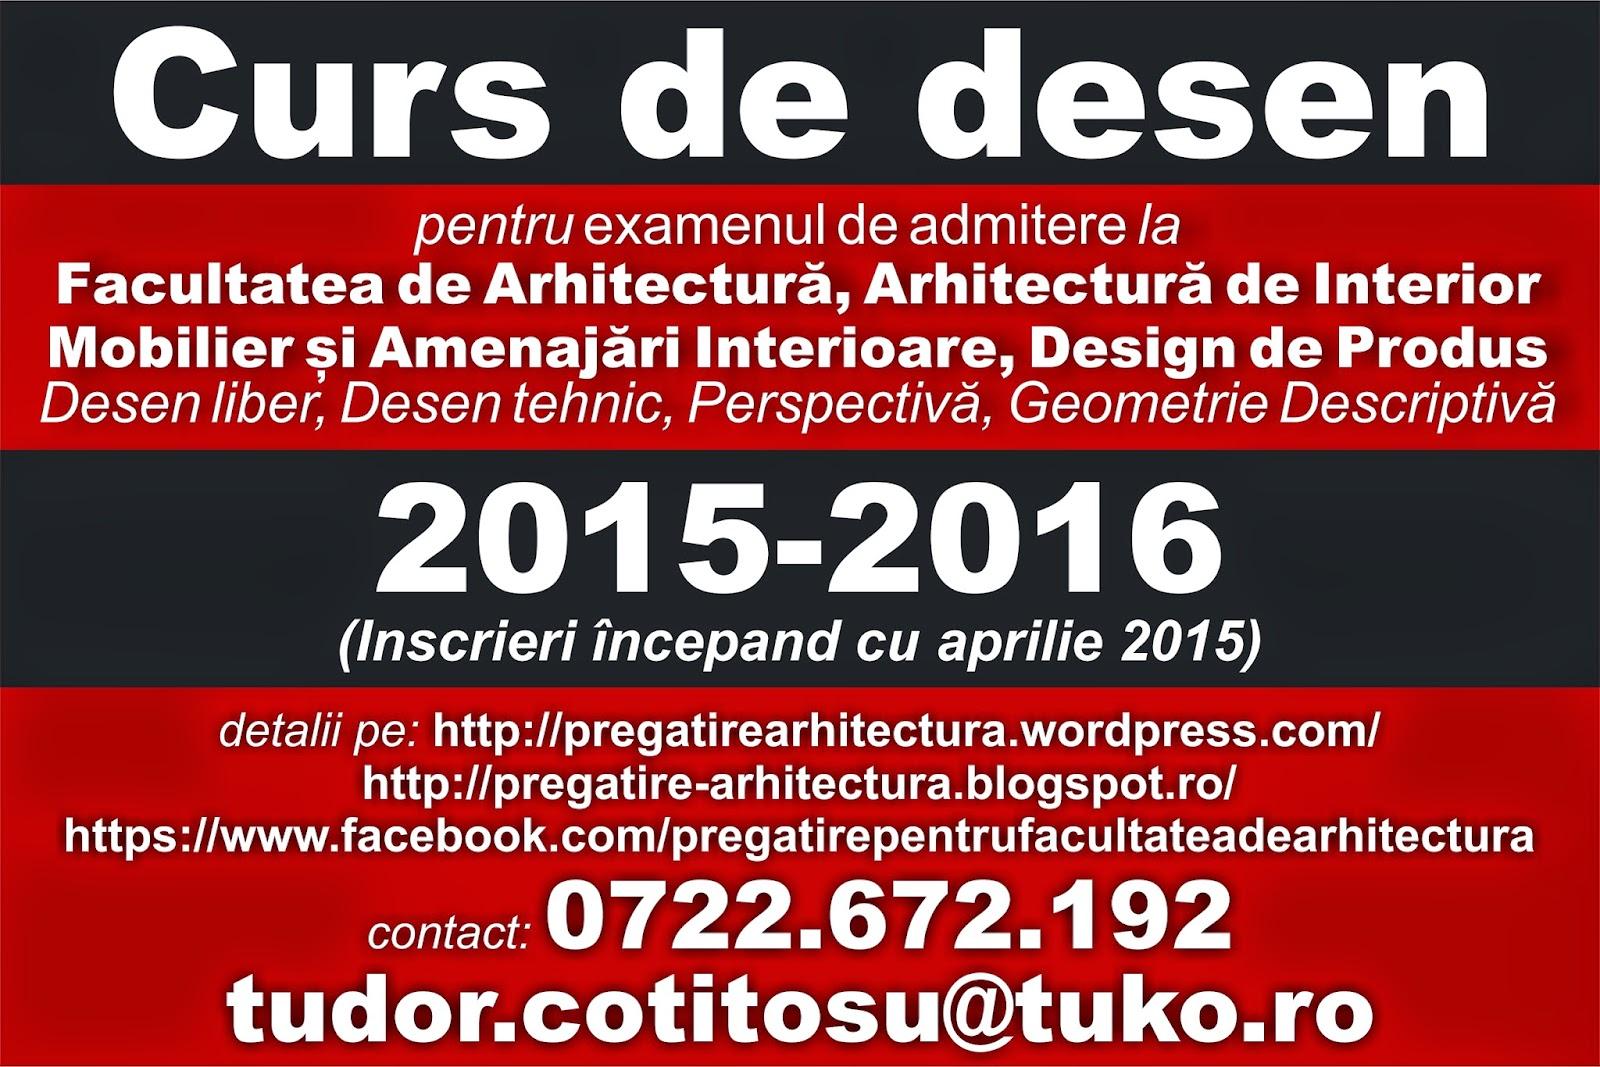 Curs de desen admitere arhitectura 2015-2016